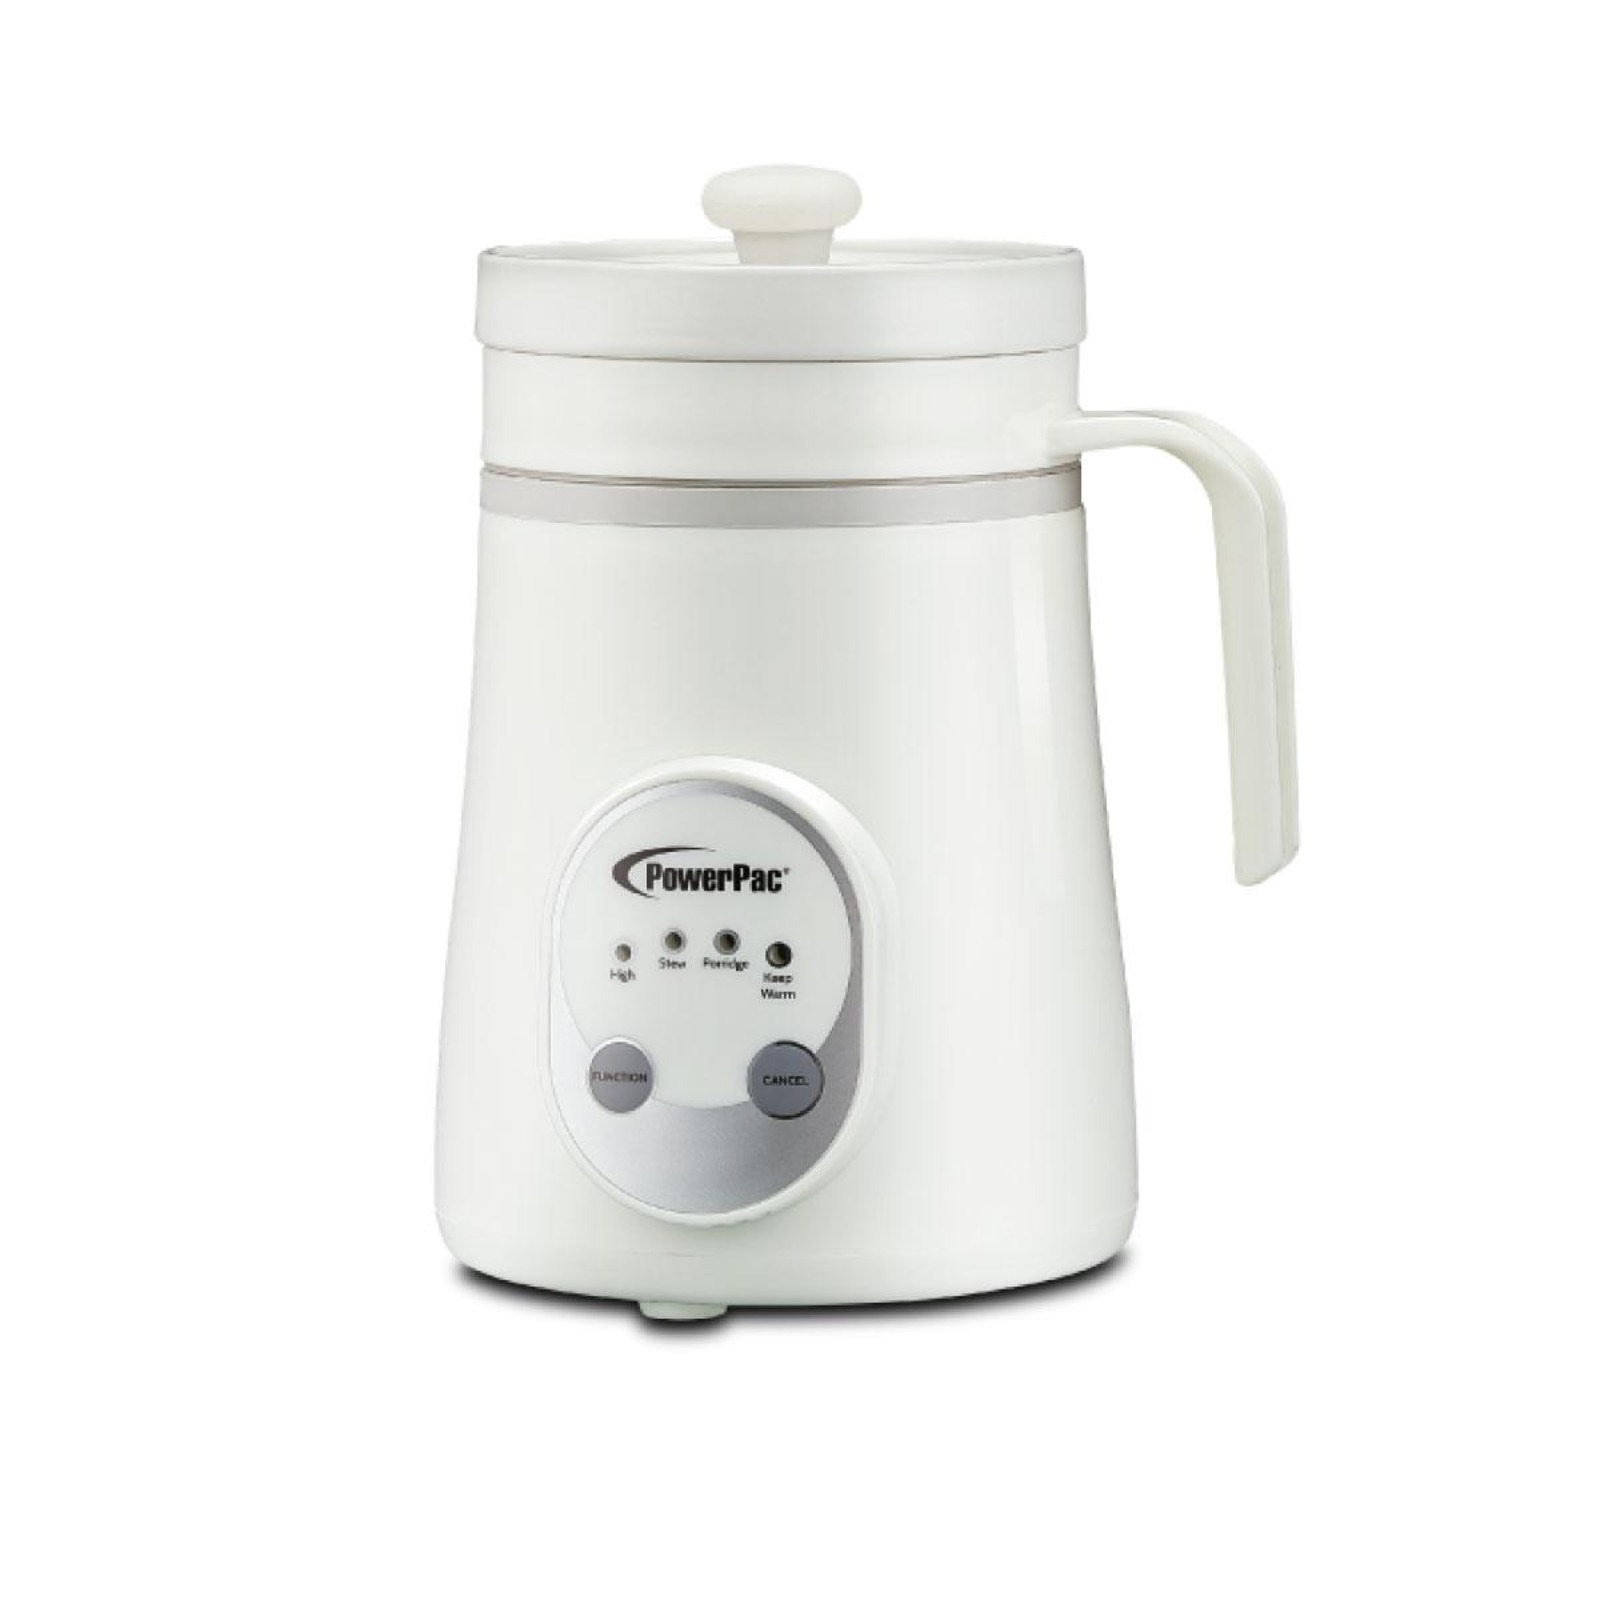 PowerPac (PPSC06) 0.6L Slow Cooker